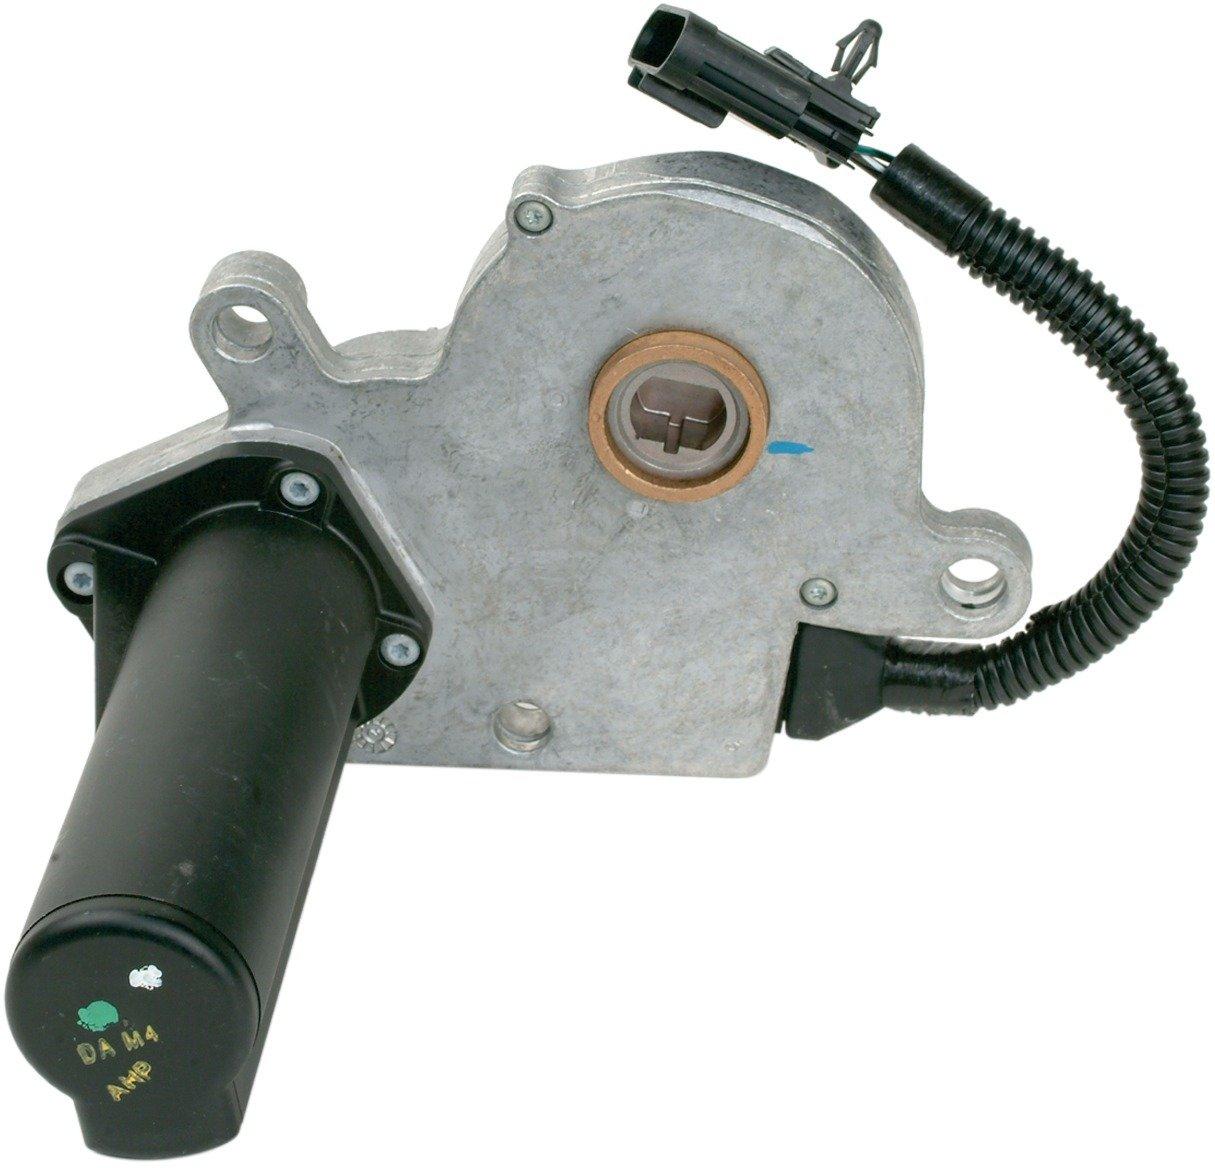 Cardone 48-108 Remanufactured Transfer Case Motor